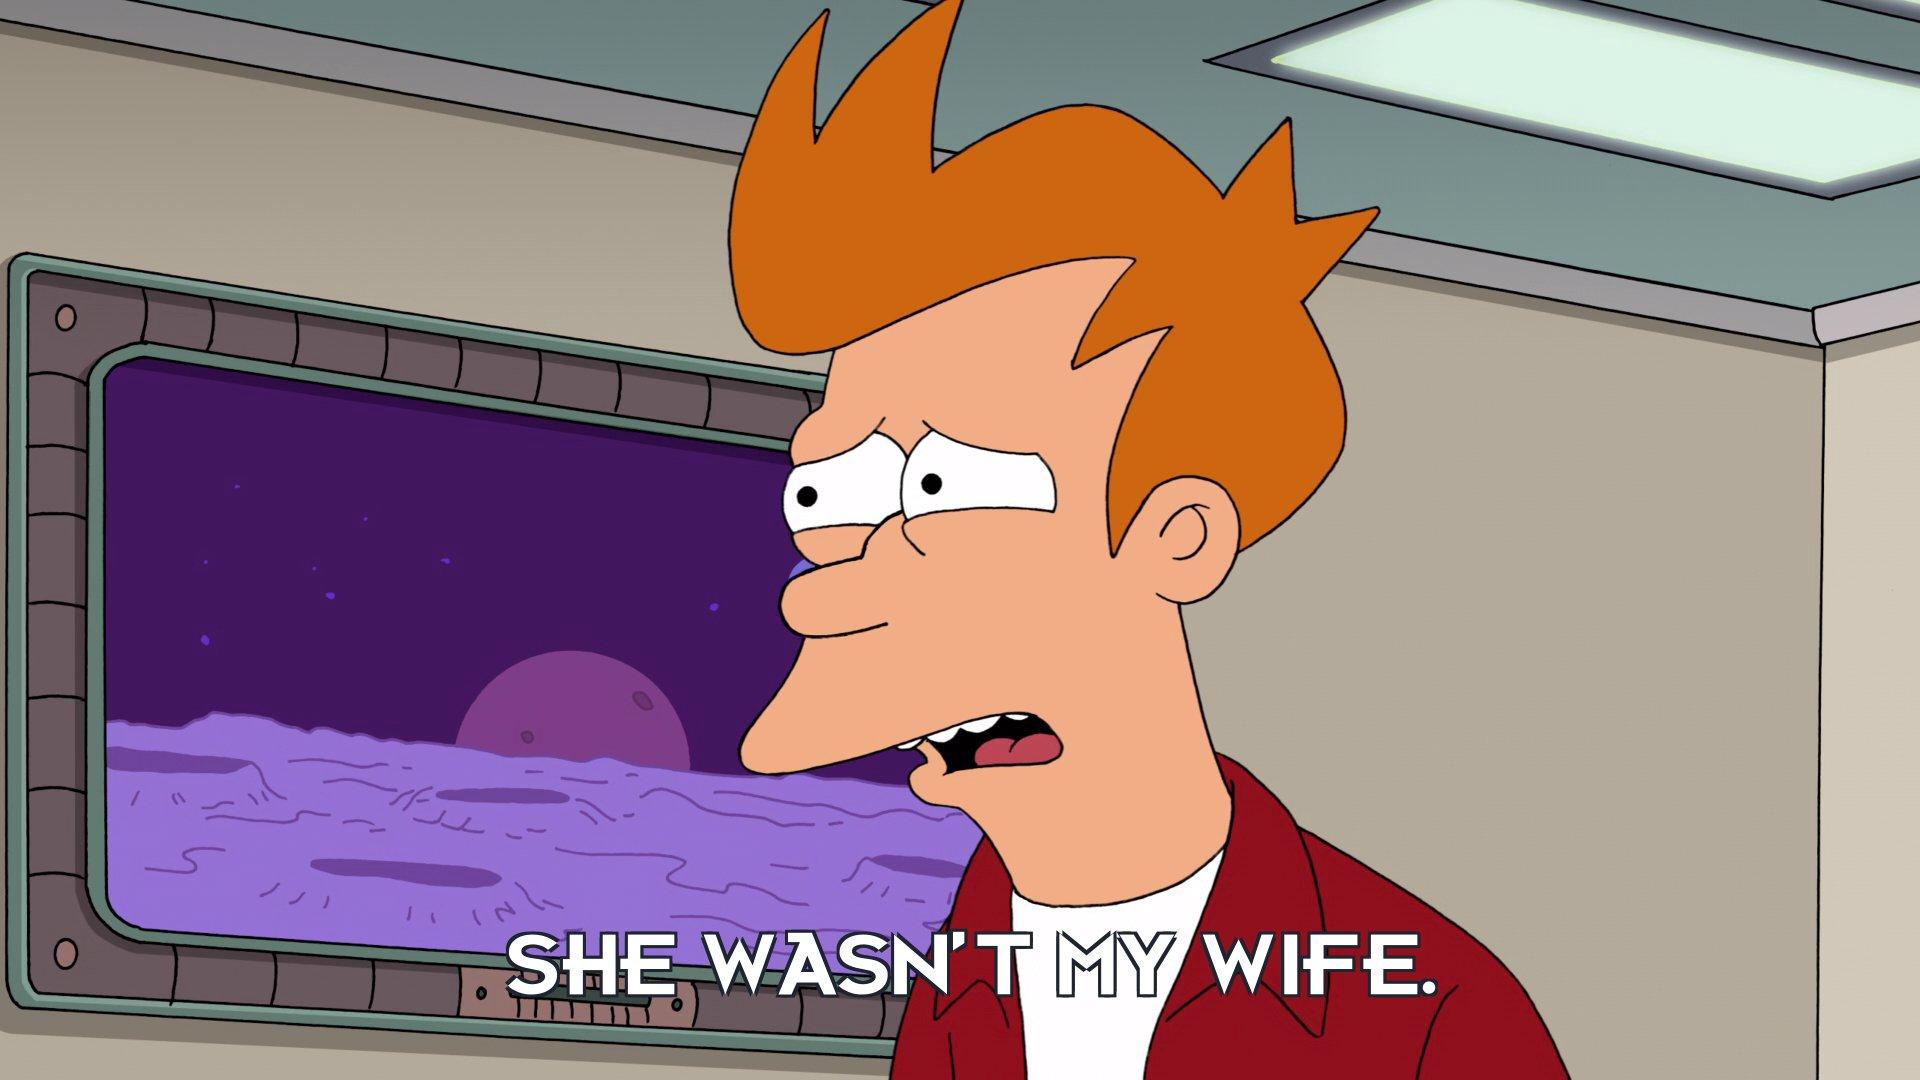 Philip J Fry: She wasn't my wife.